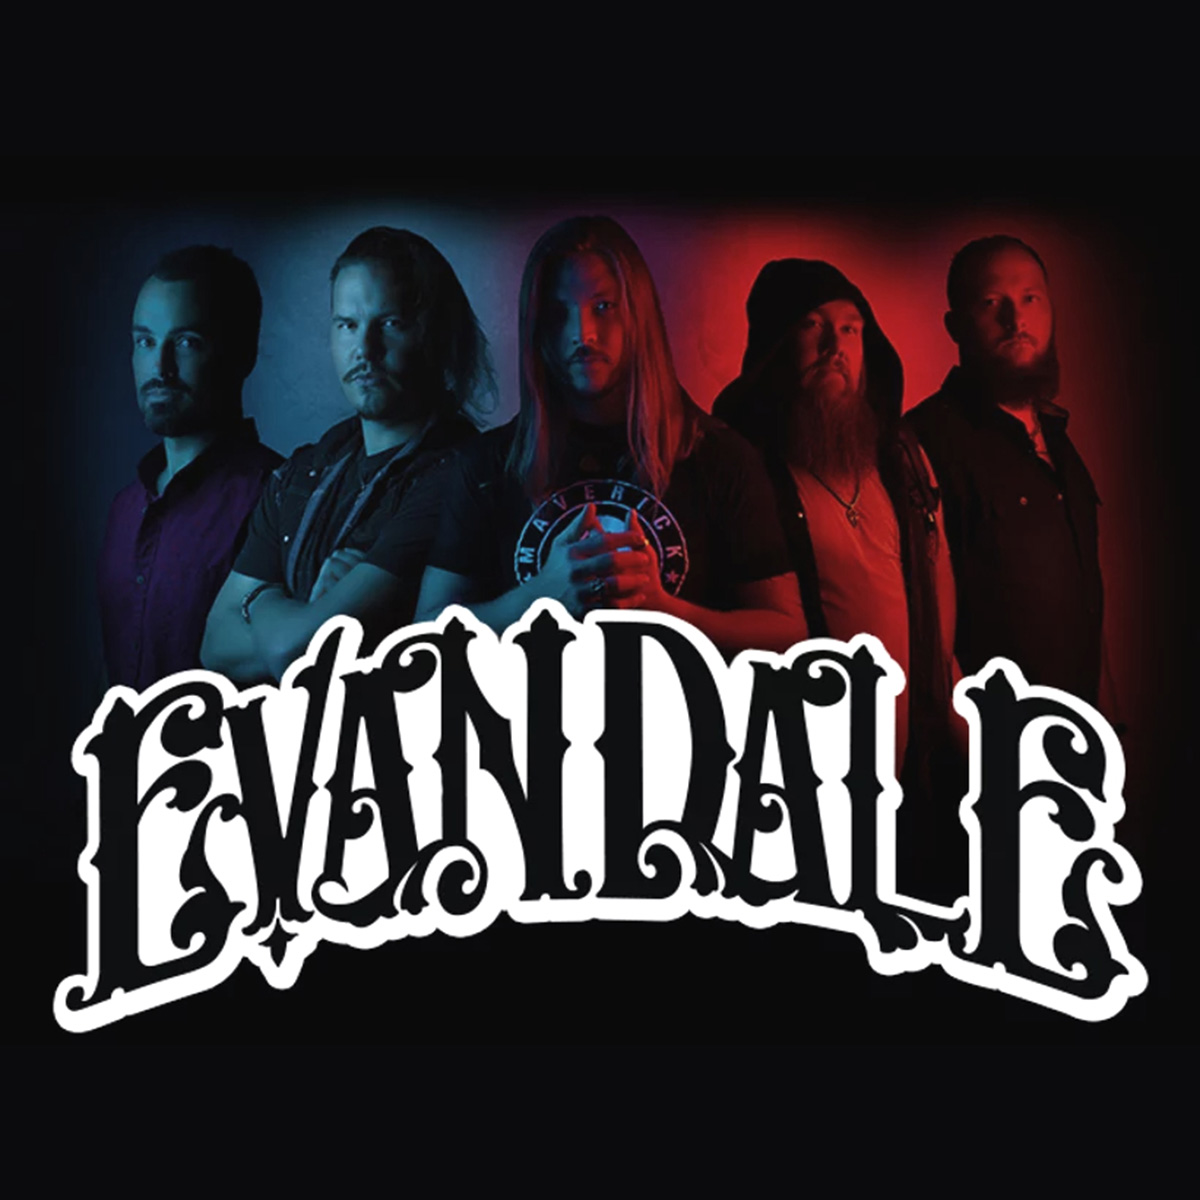 Evandale: Main Image